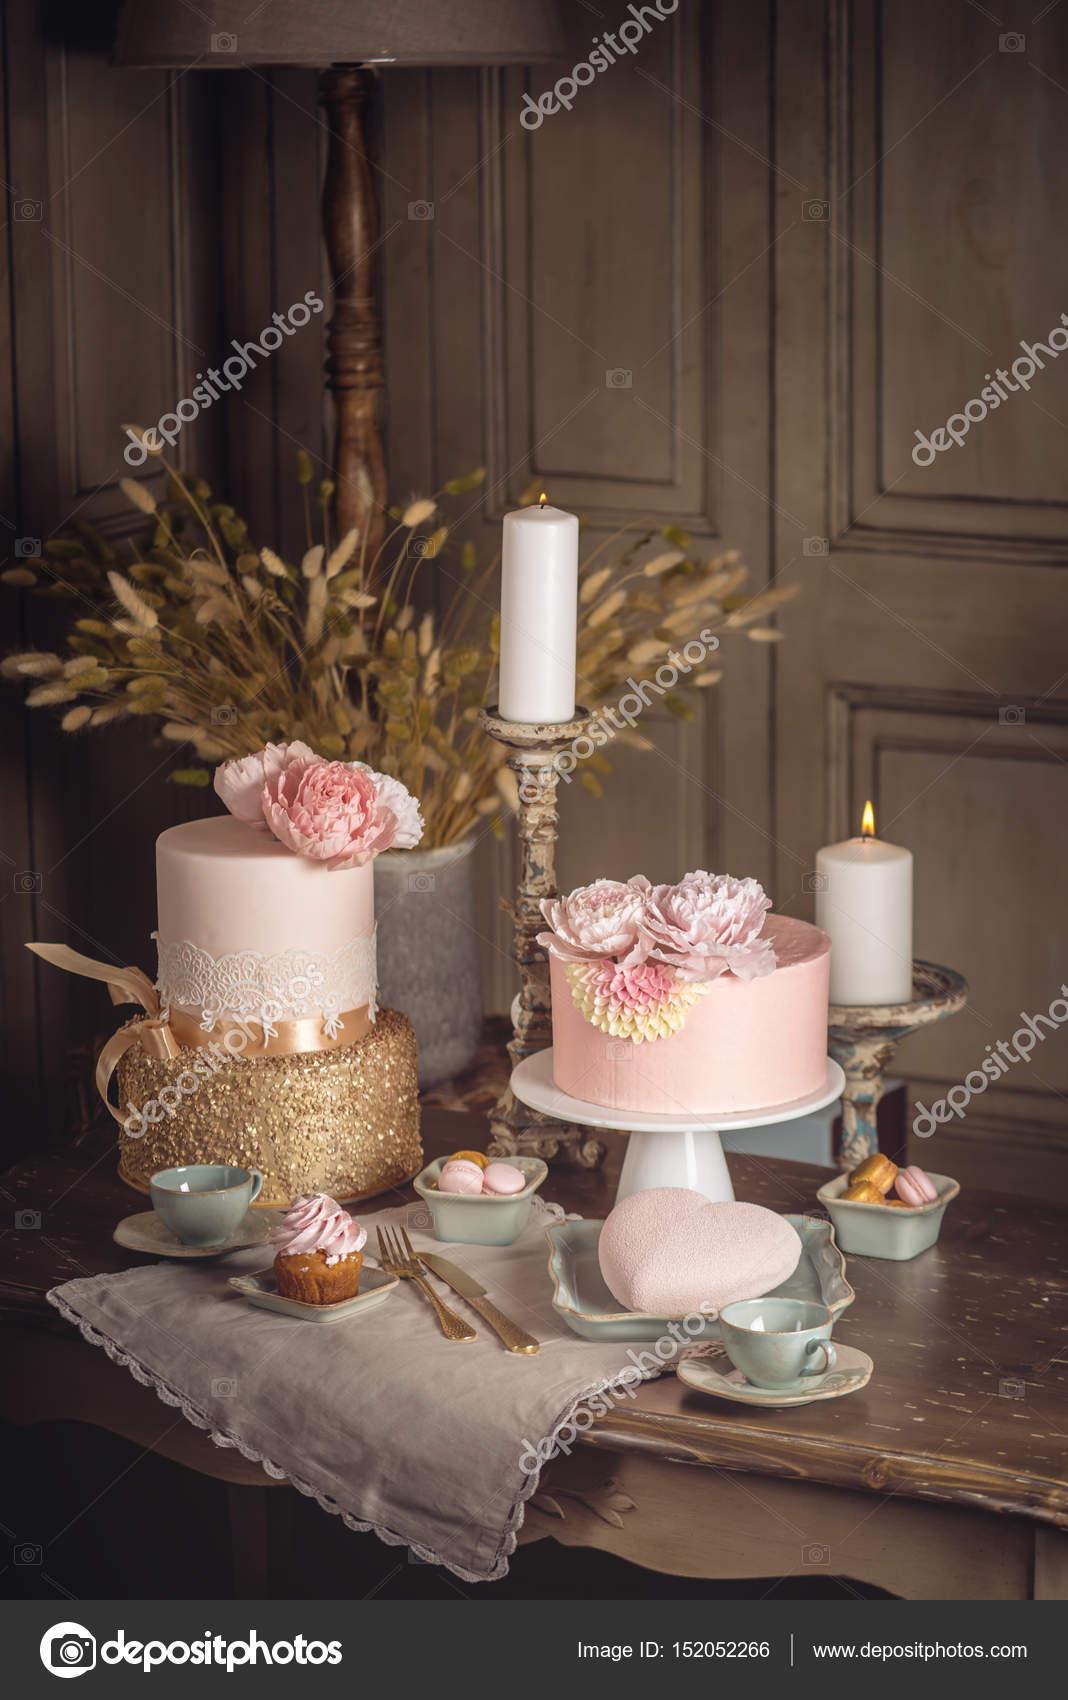 Terrific Rose Gold Birthday Cakes Luxury Wedding Table With A Beautiful Funny Birthday Cards Online Inifodamsfinfo